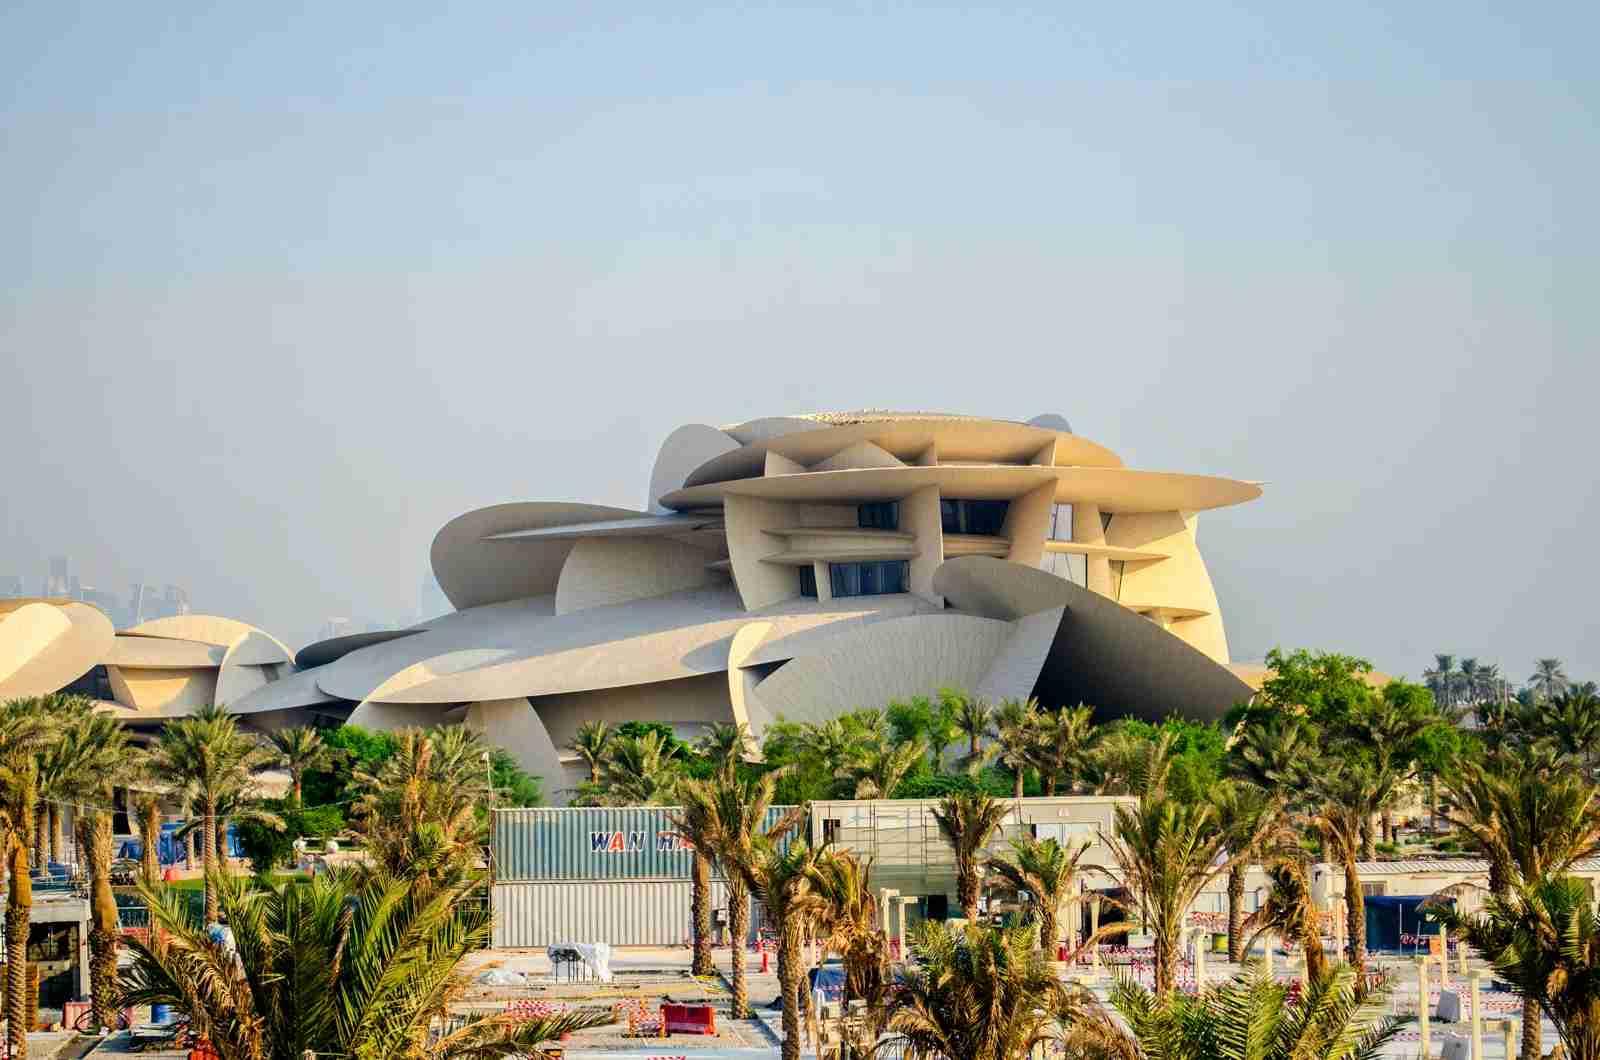 The National Museum of Qatar. (Photo by PremChokli / Shutterstock)